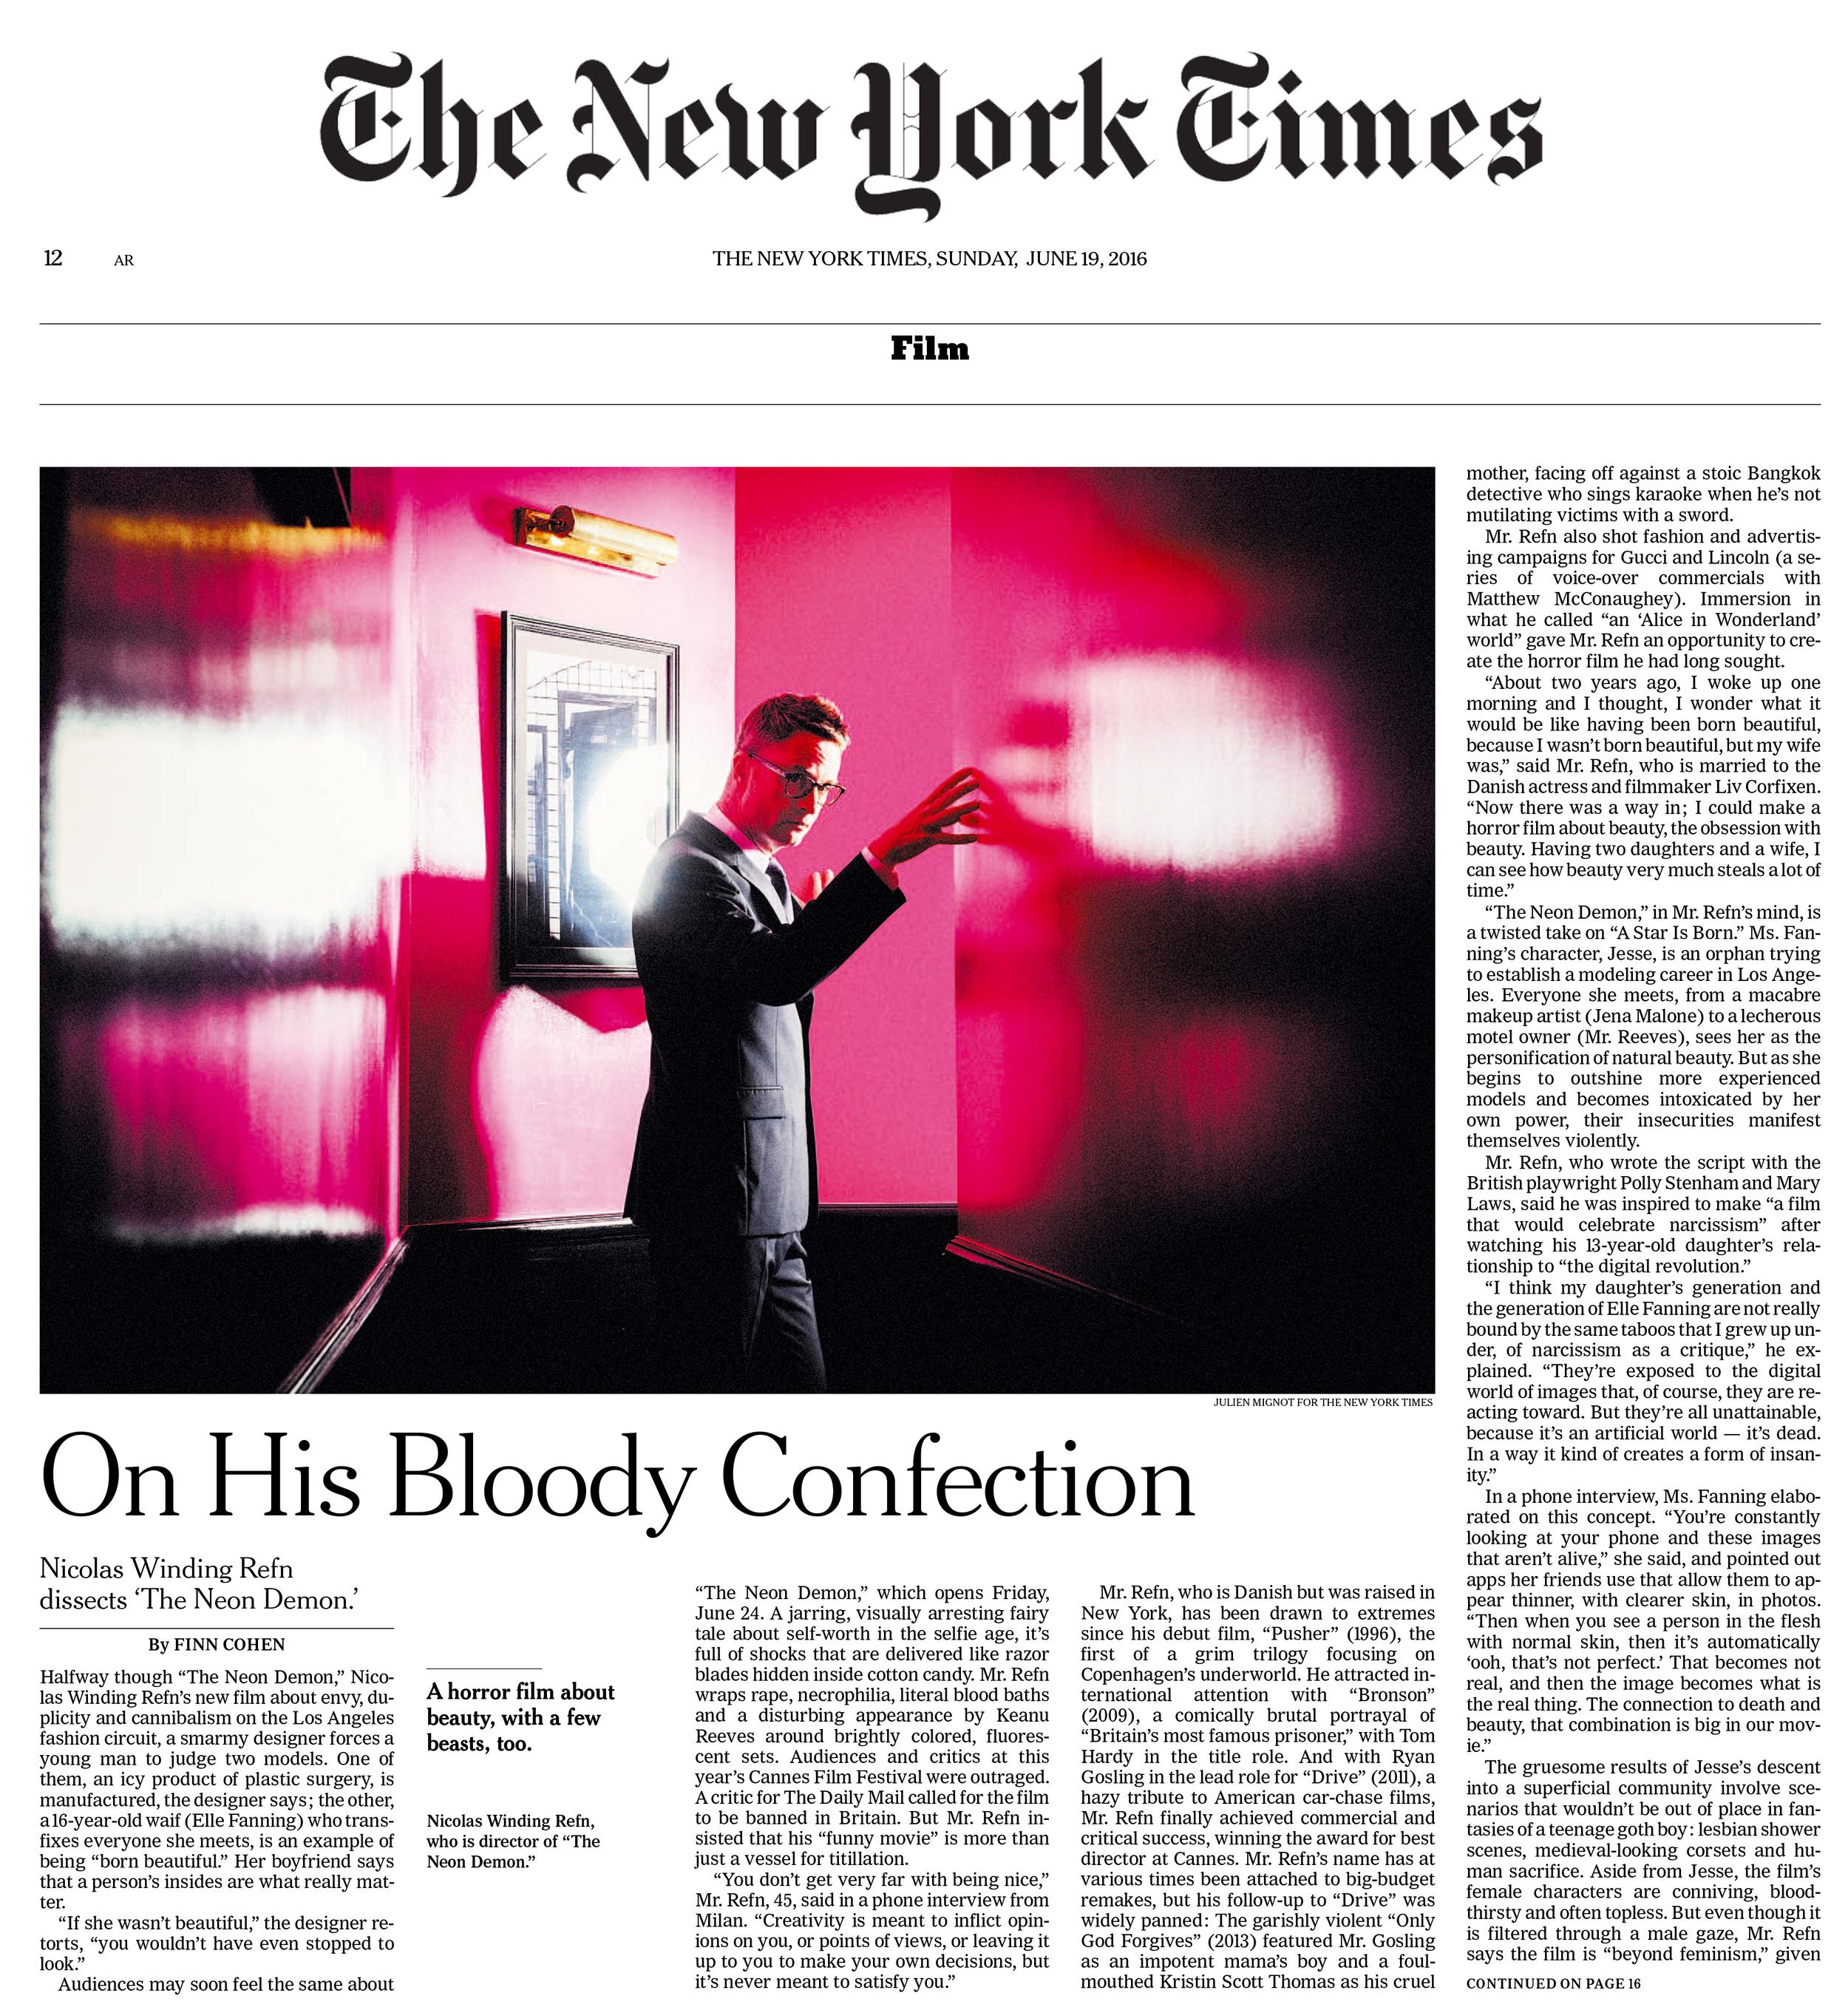 NEW-YORK TIMES